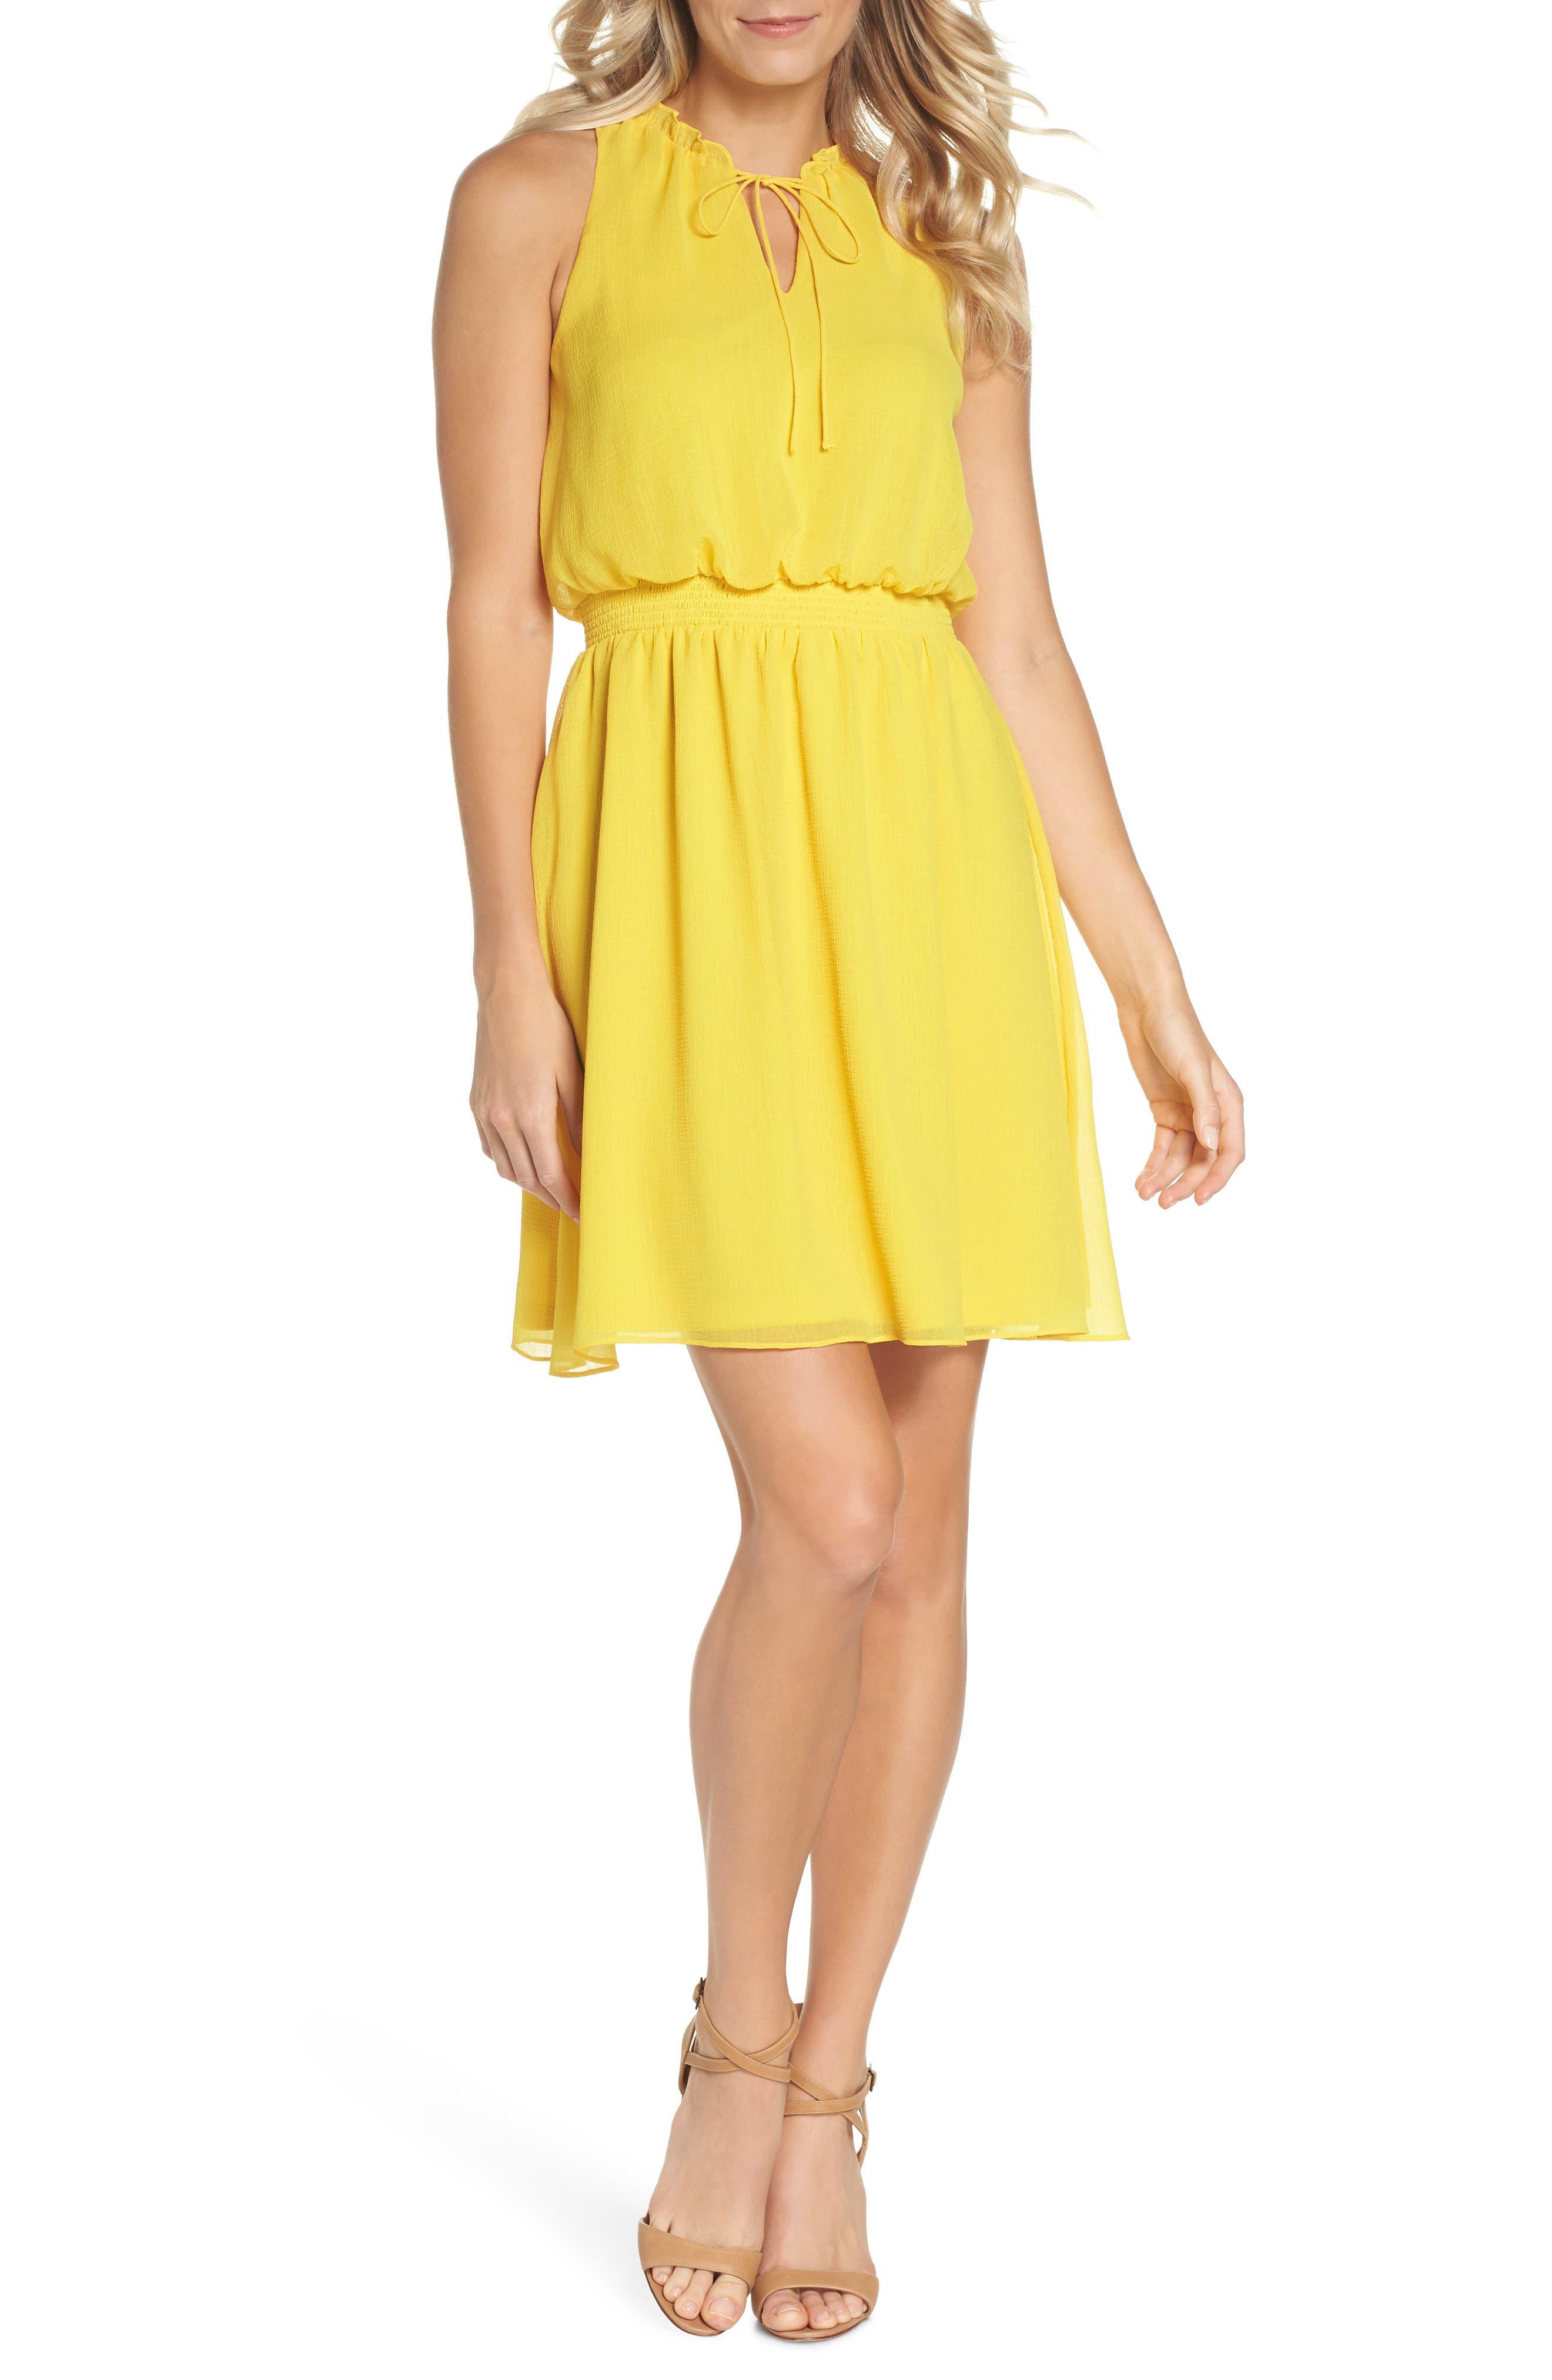 Adrianna Papell Sleeveless Chiffon Blouson Dress